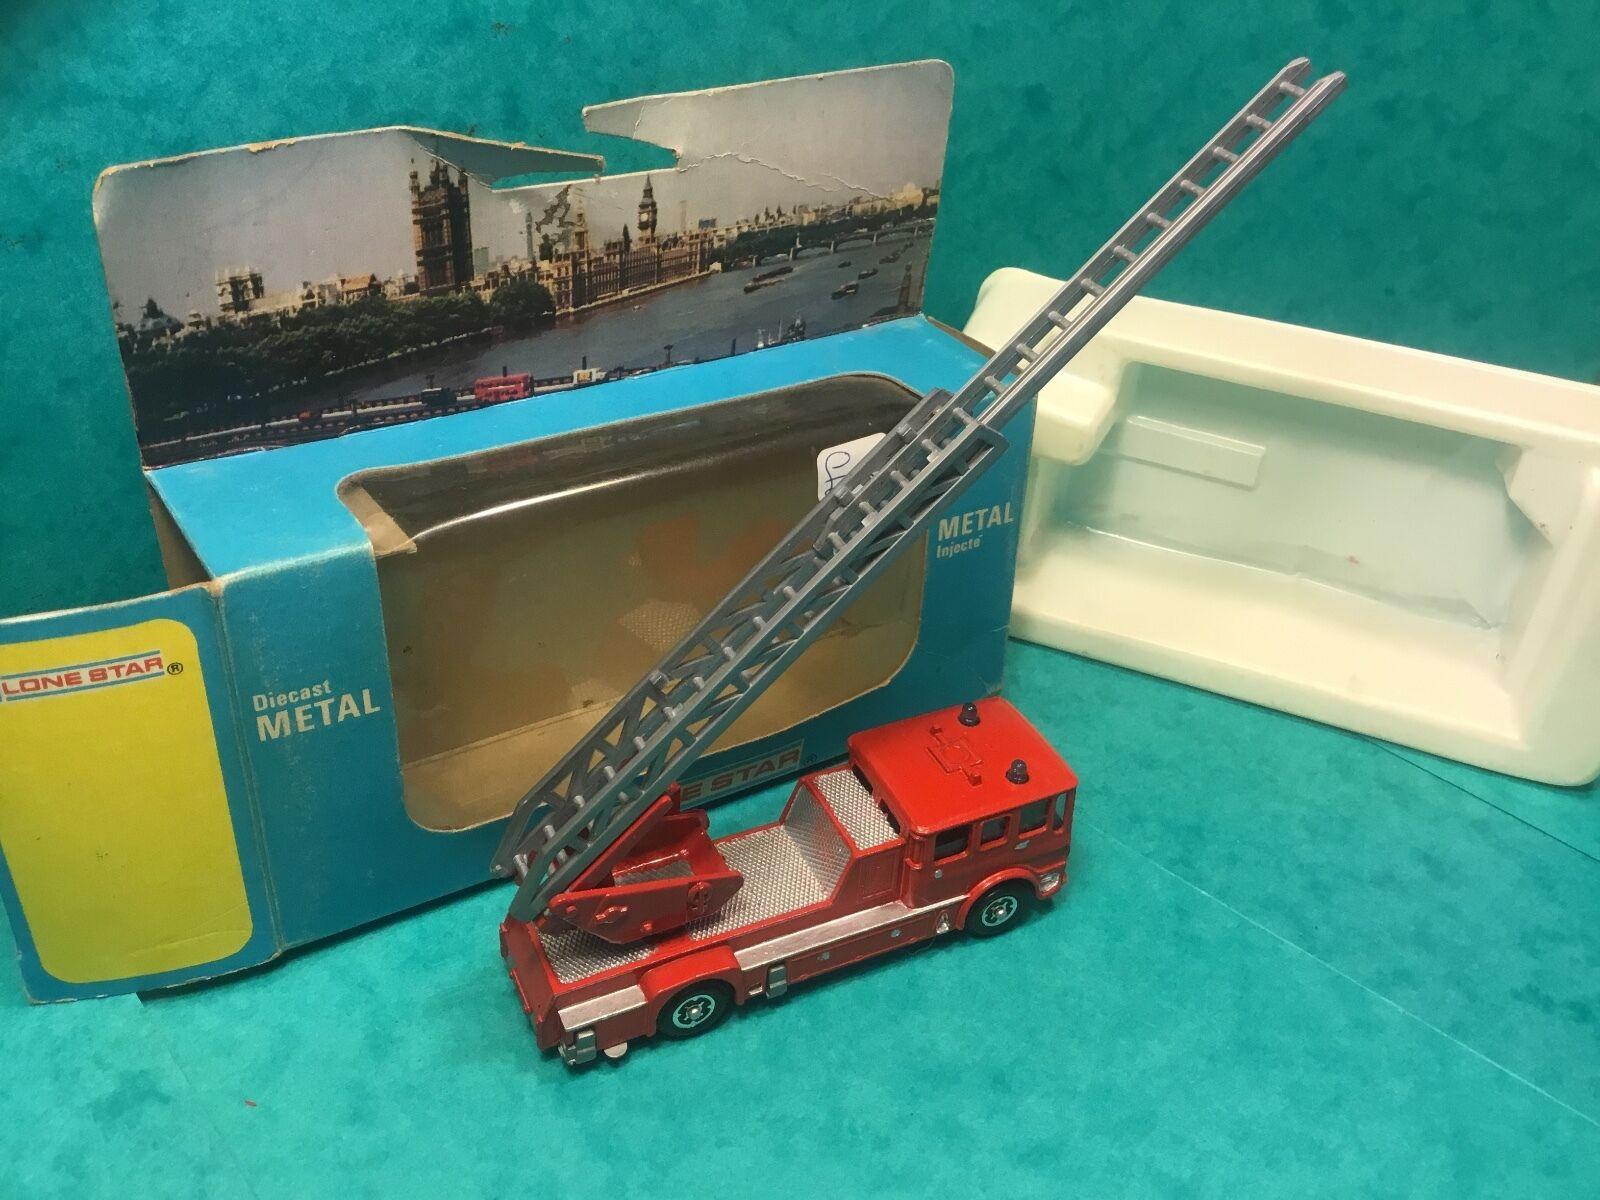 tiempo libre Lone Estrella Diecast Metal 1980 feliz clima h.t.t.l bomberos Impy Impy Impy súper coches  entrega gratis